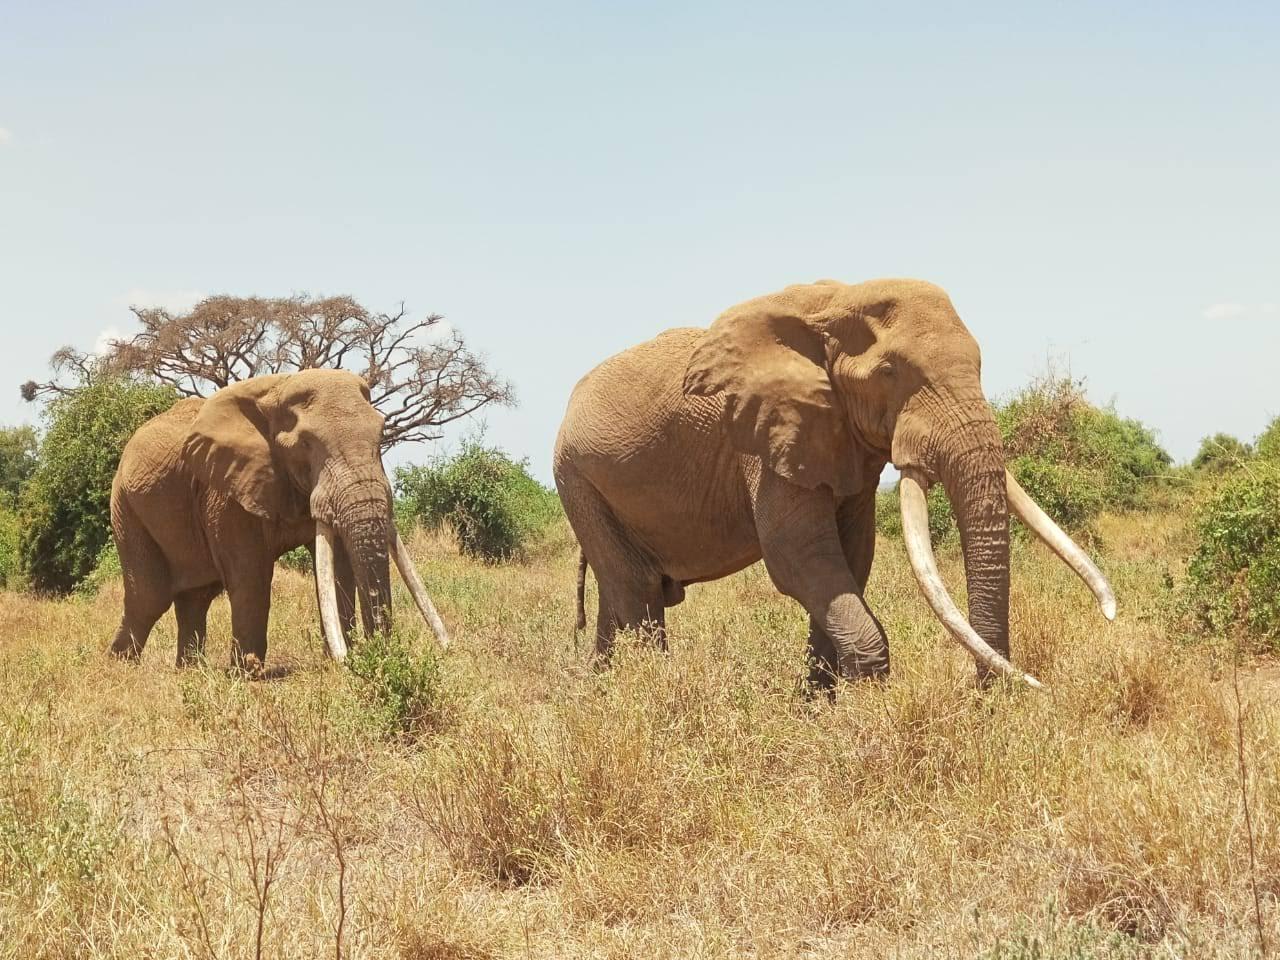 elefantes en el parque nacional de samburu, kenia